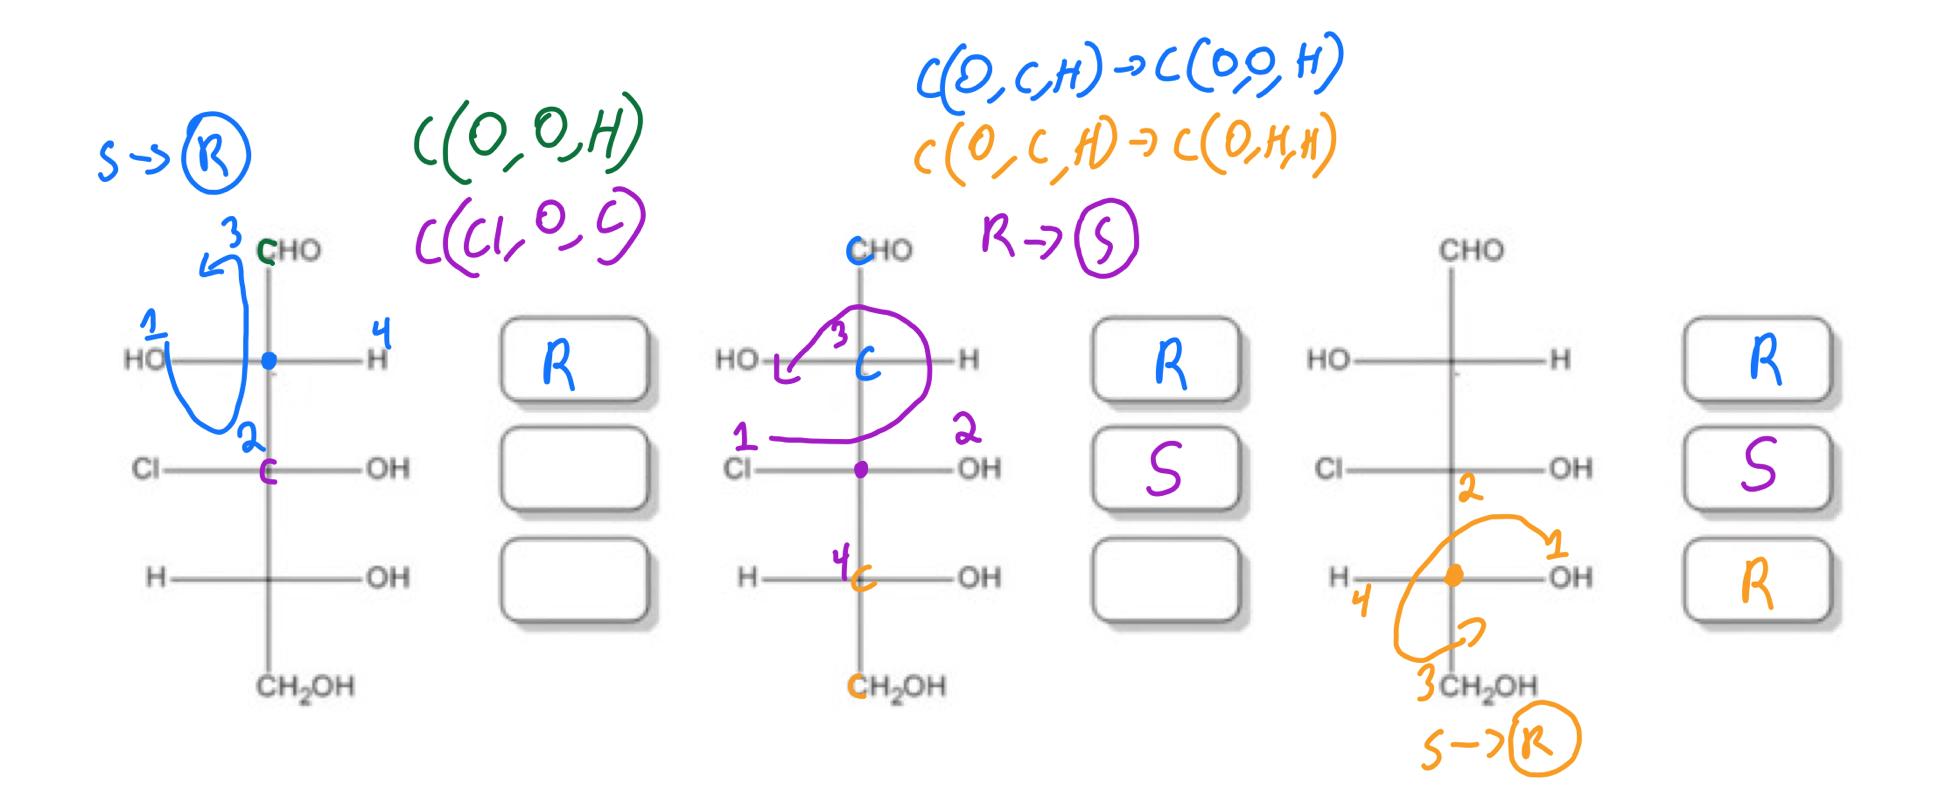 3-chloro-2,3,4,5-tetrahydroxypentanal-with-stereochemistry